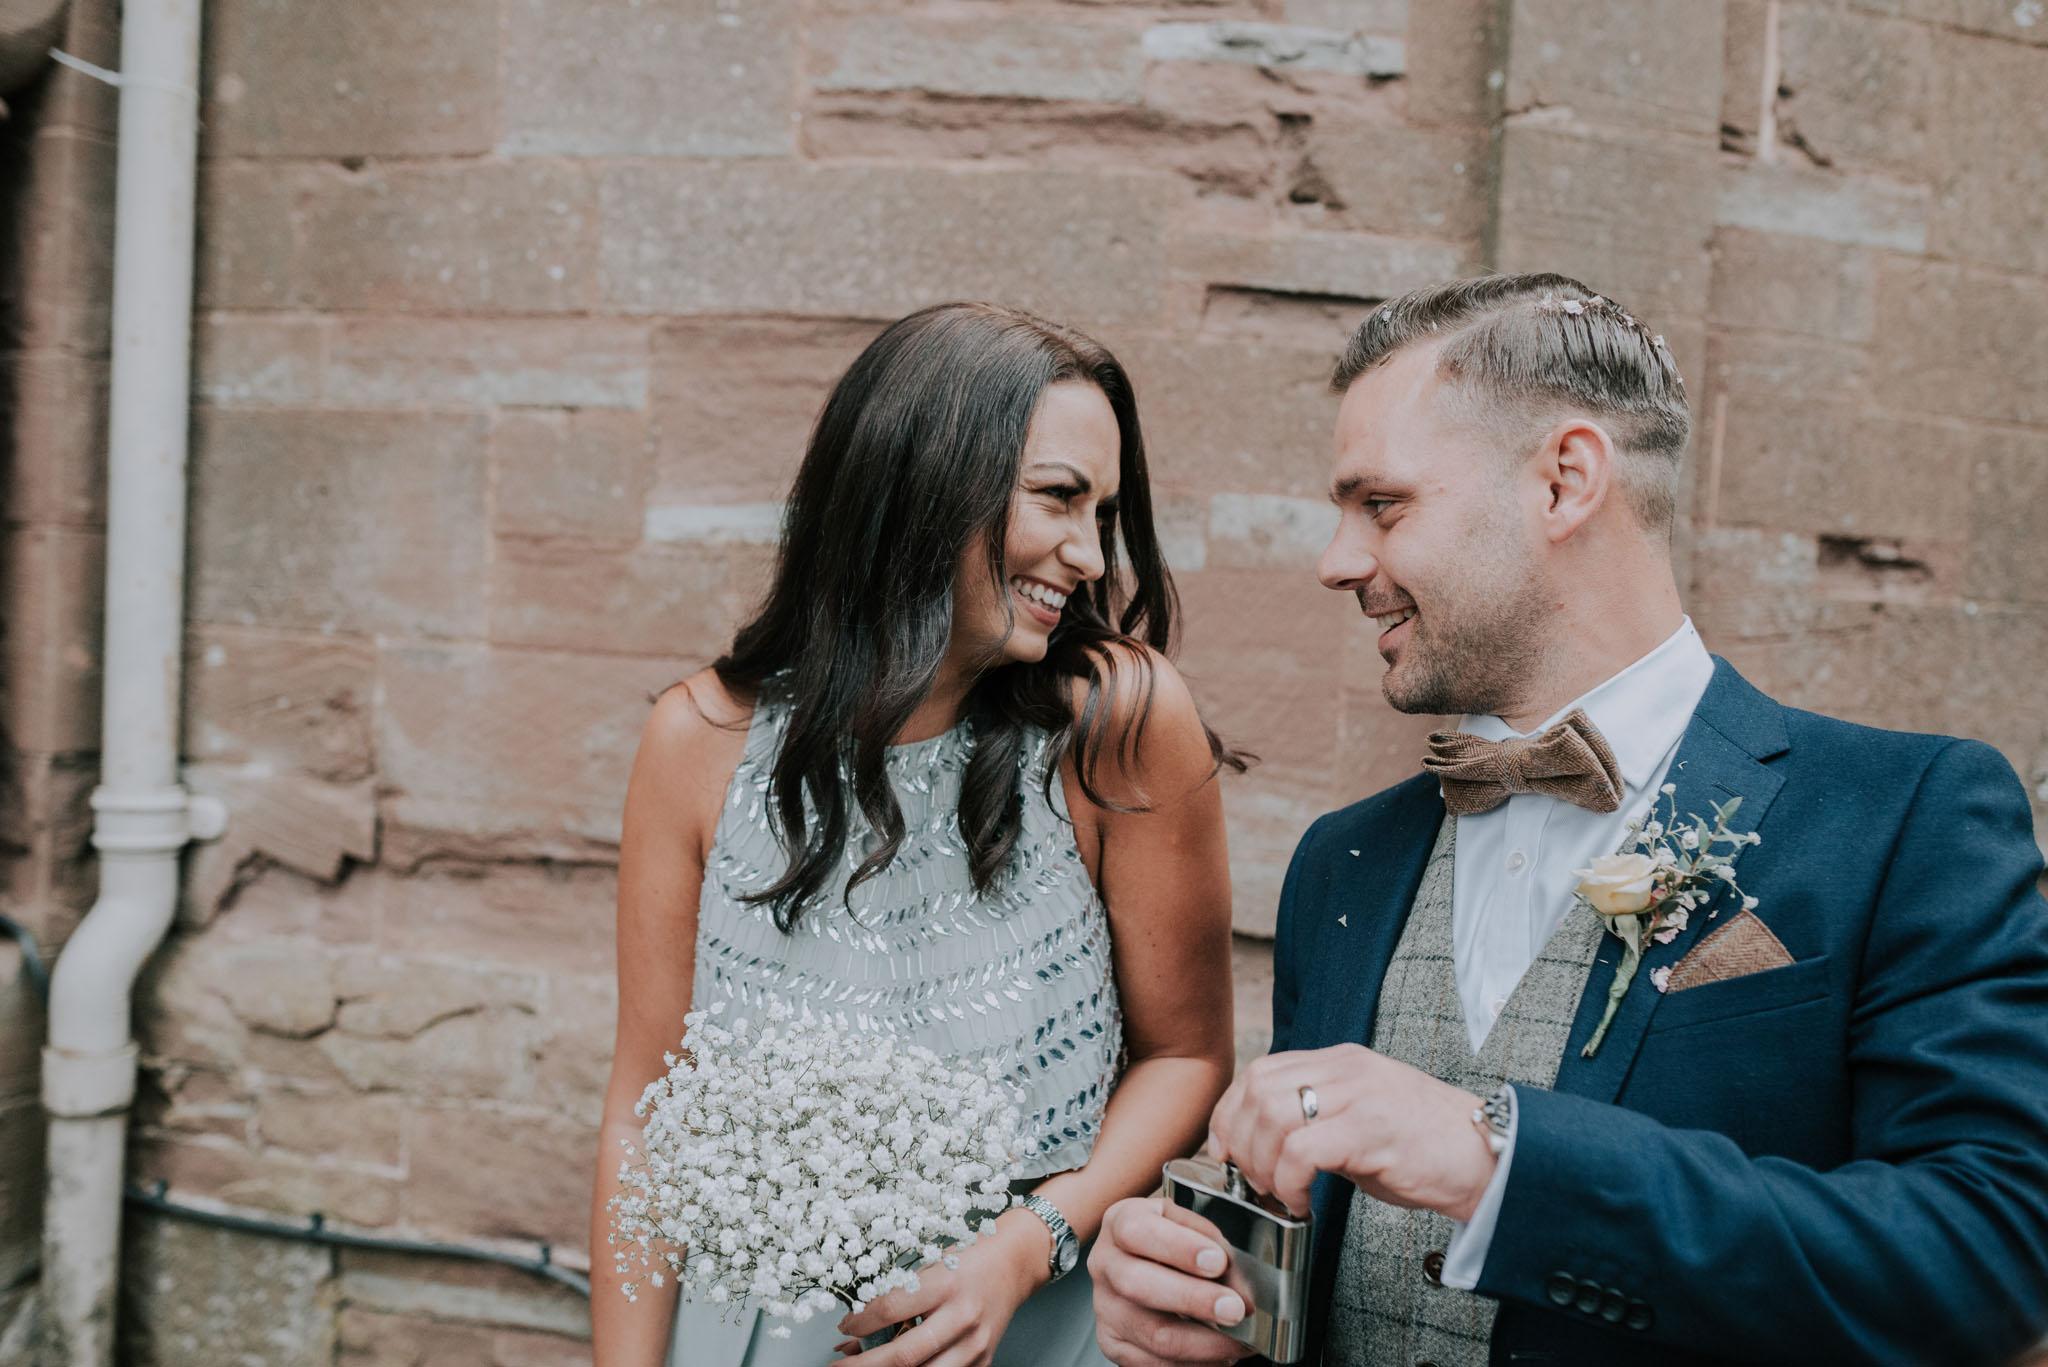 wedding-photographer-glewstone-court-hereford-scott-stockwell-photography268.jpg